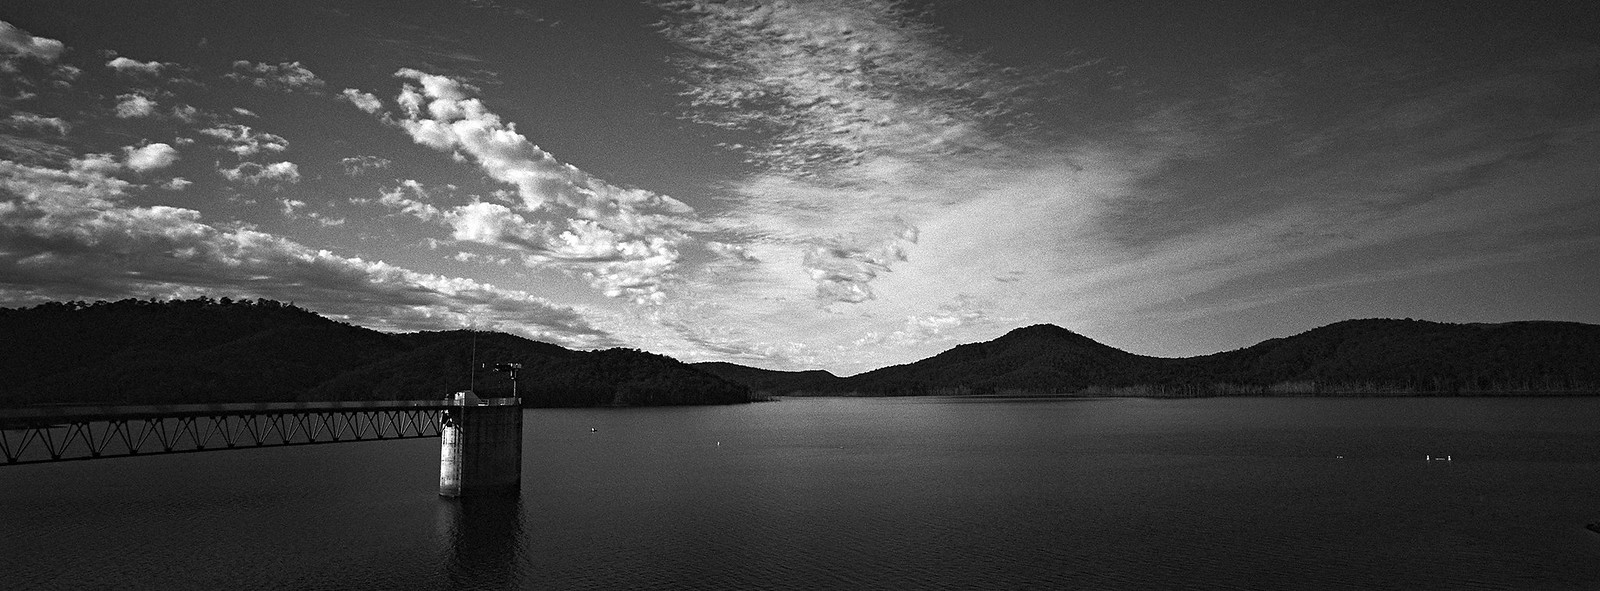 Hinz Dam ii